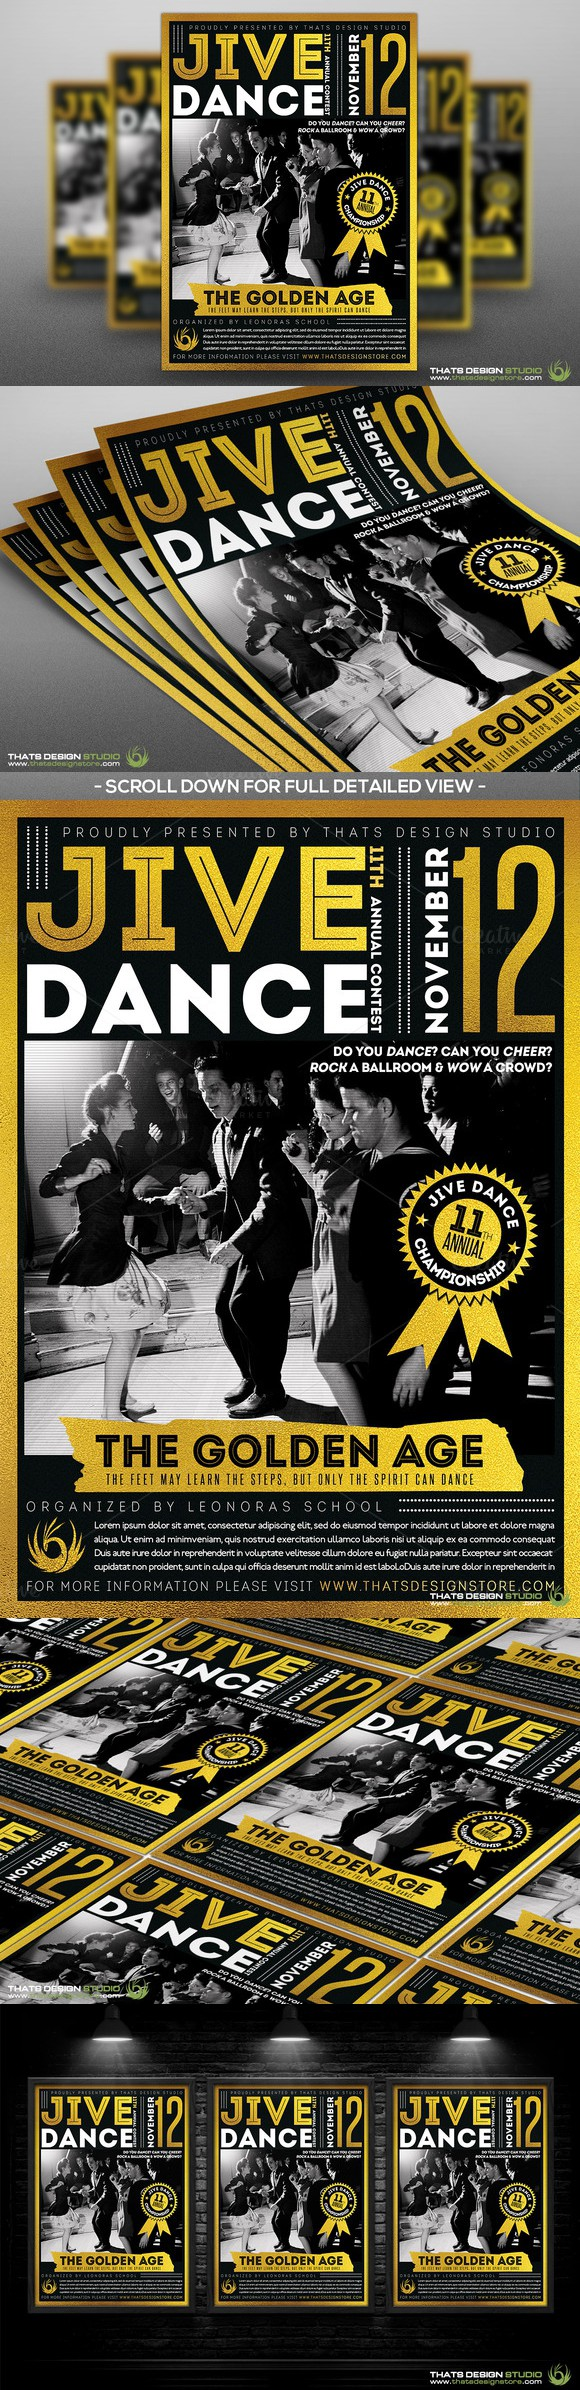 Jive Dance Flyer Template. Flyer Templates. $9.00 | Flyer Templates ...